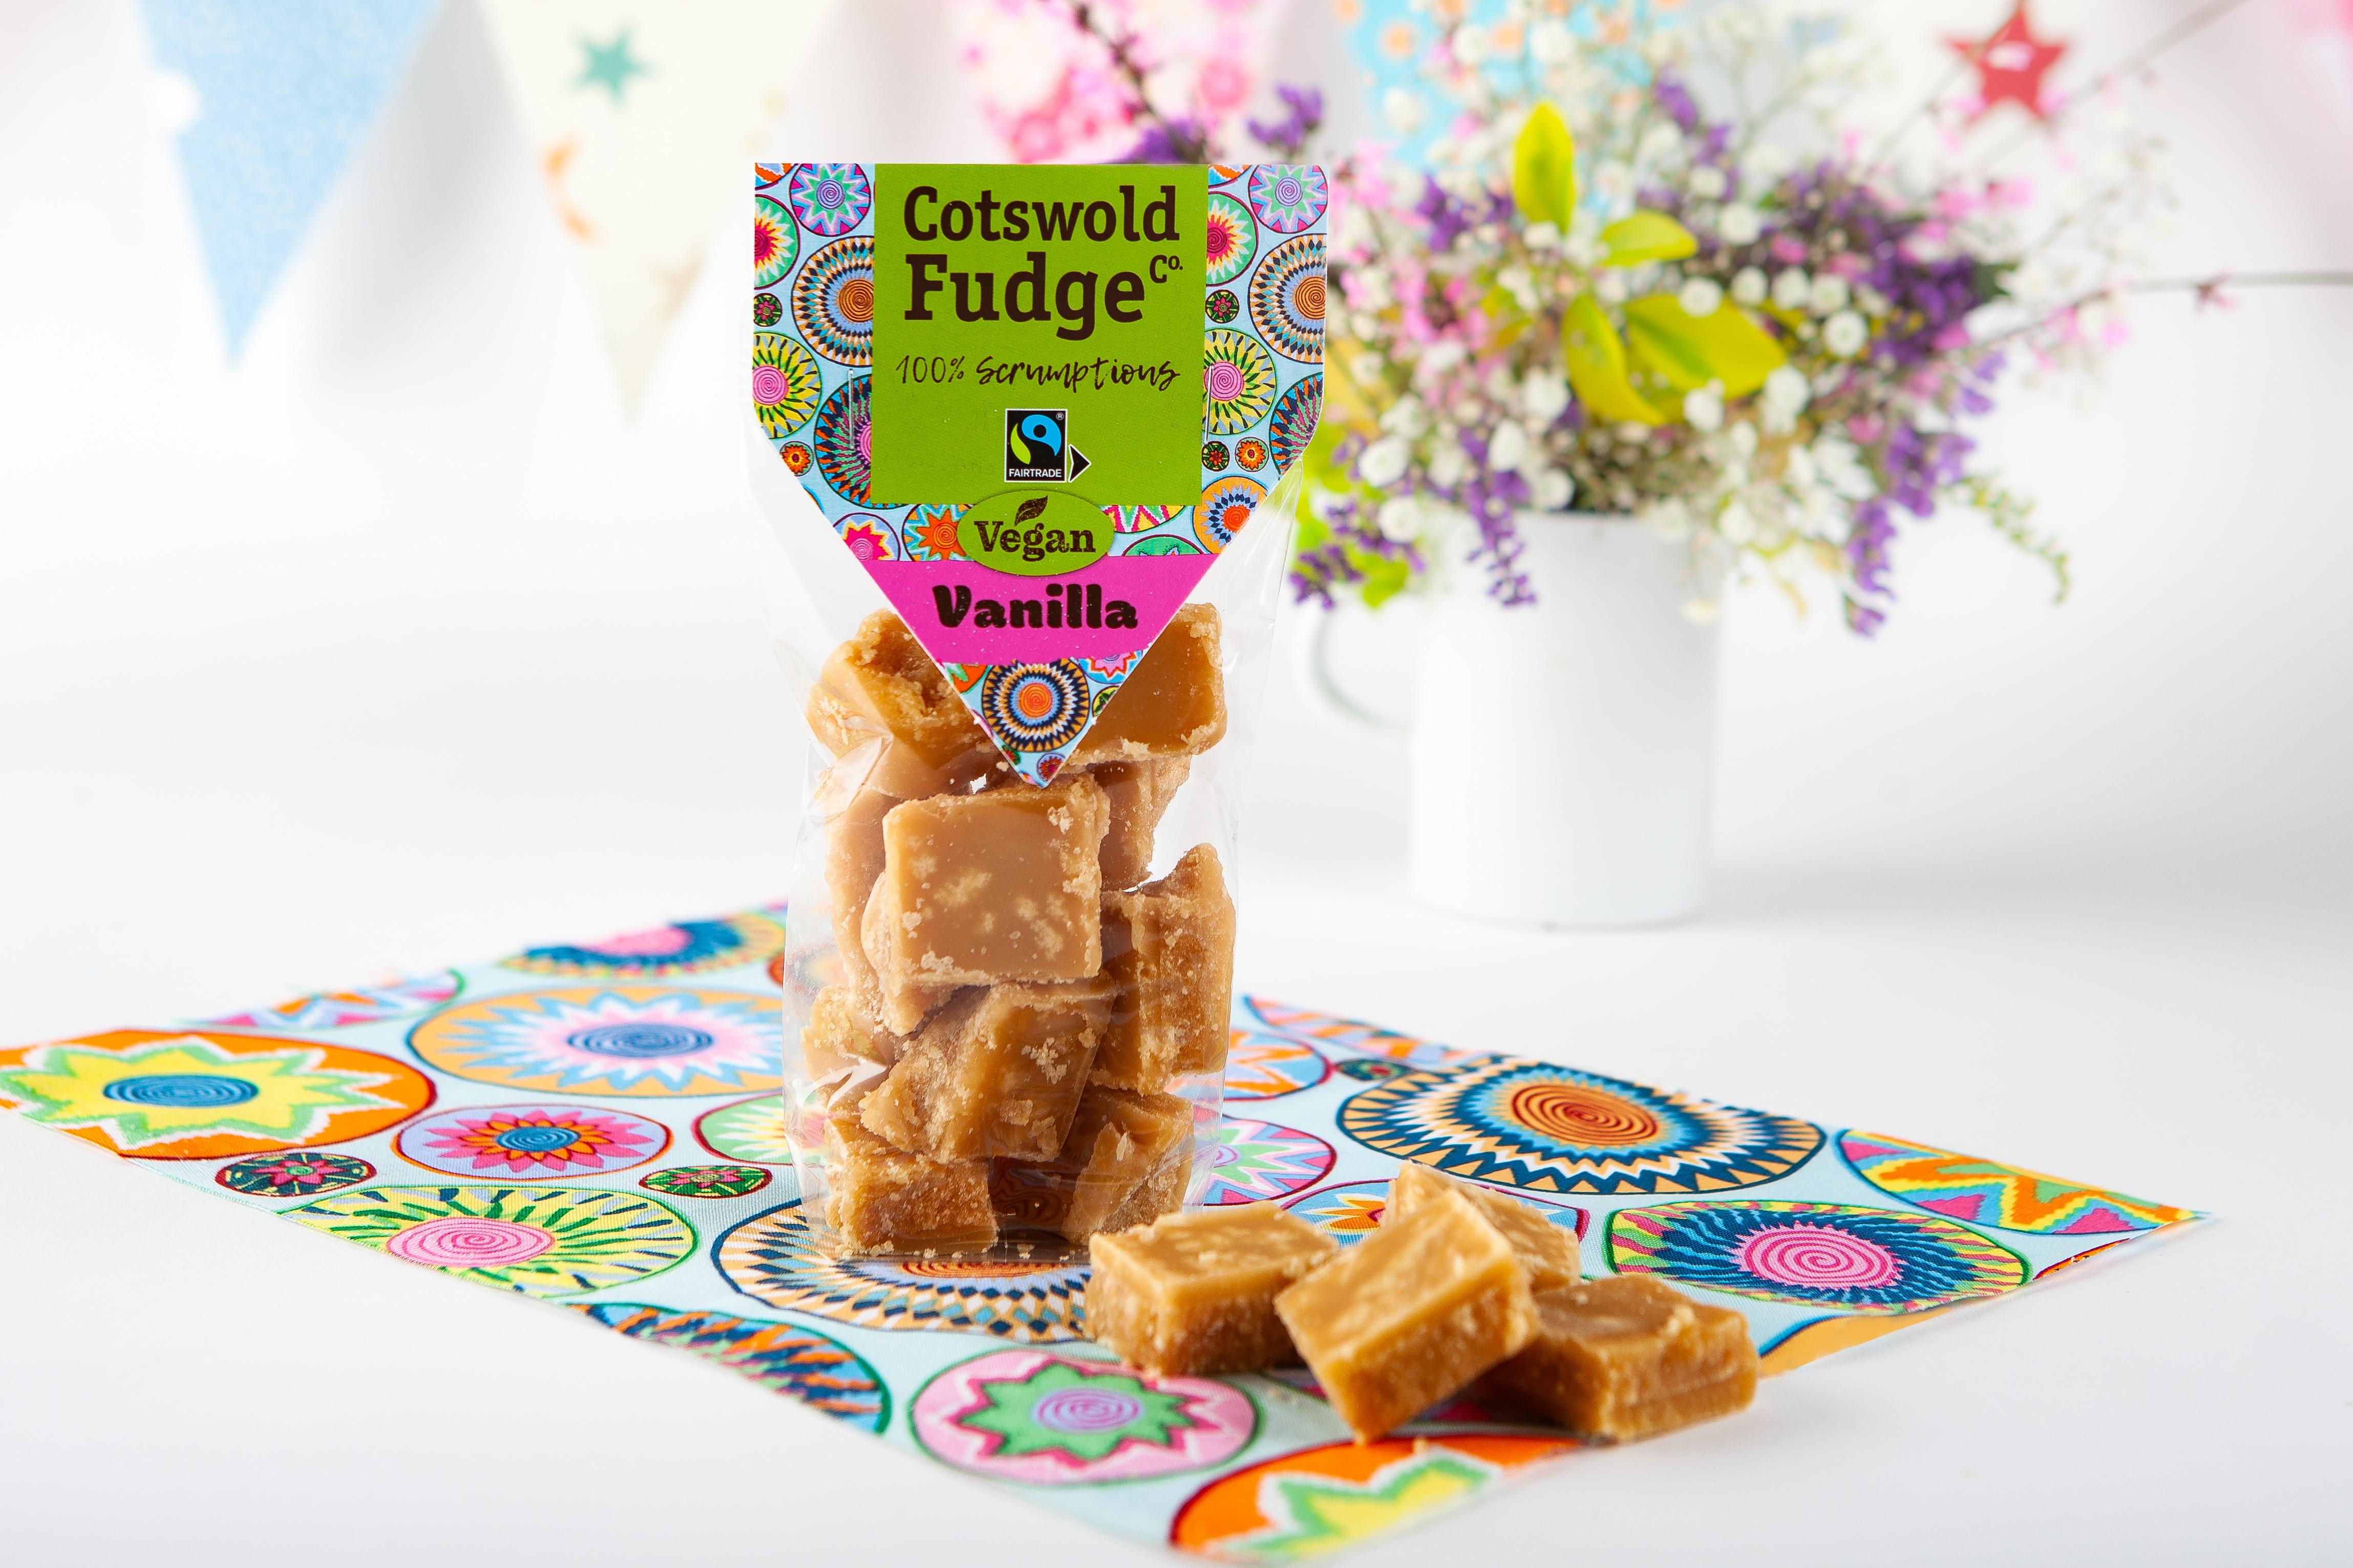 Cotswold Fudge Co Vegan Vanilla